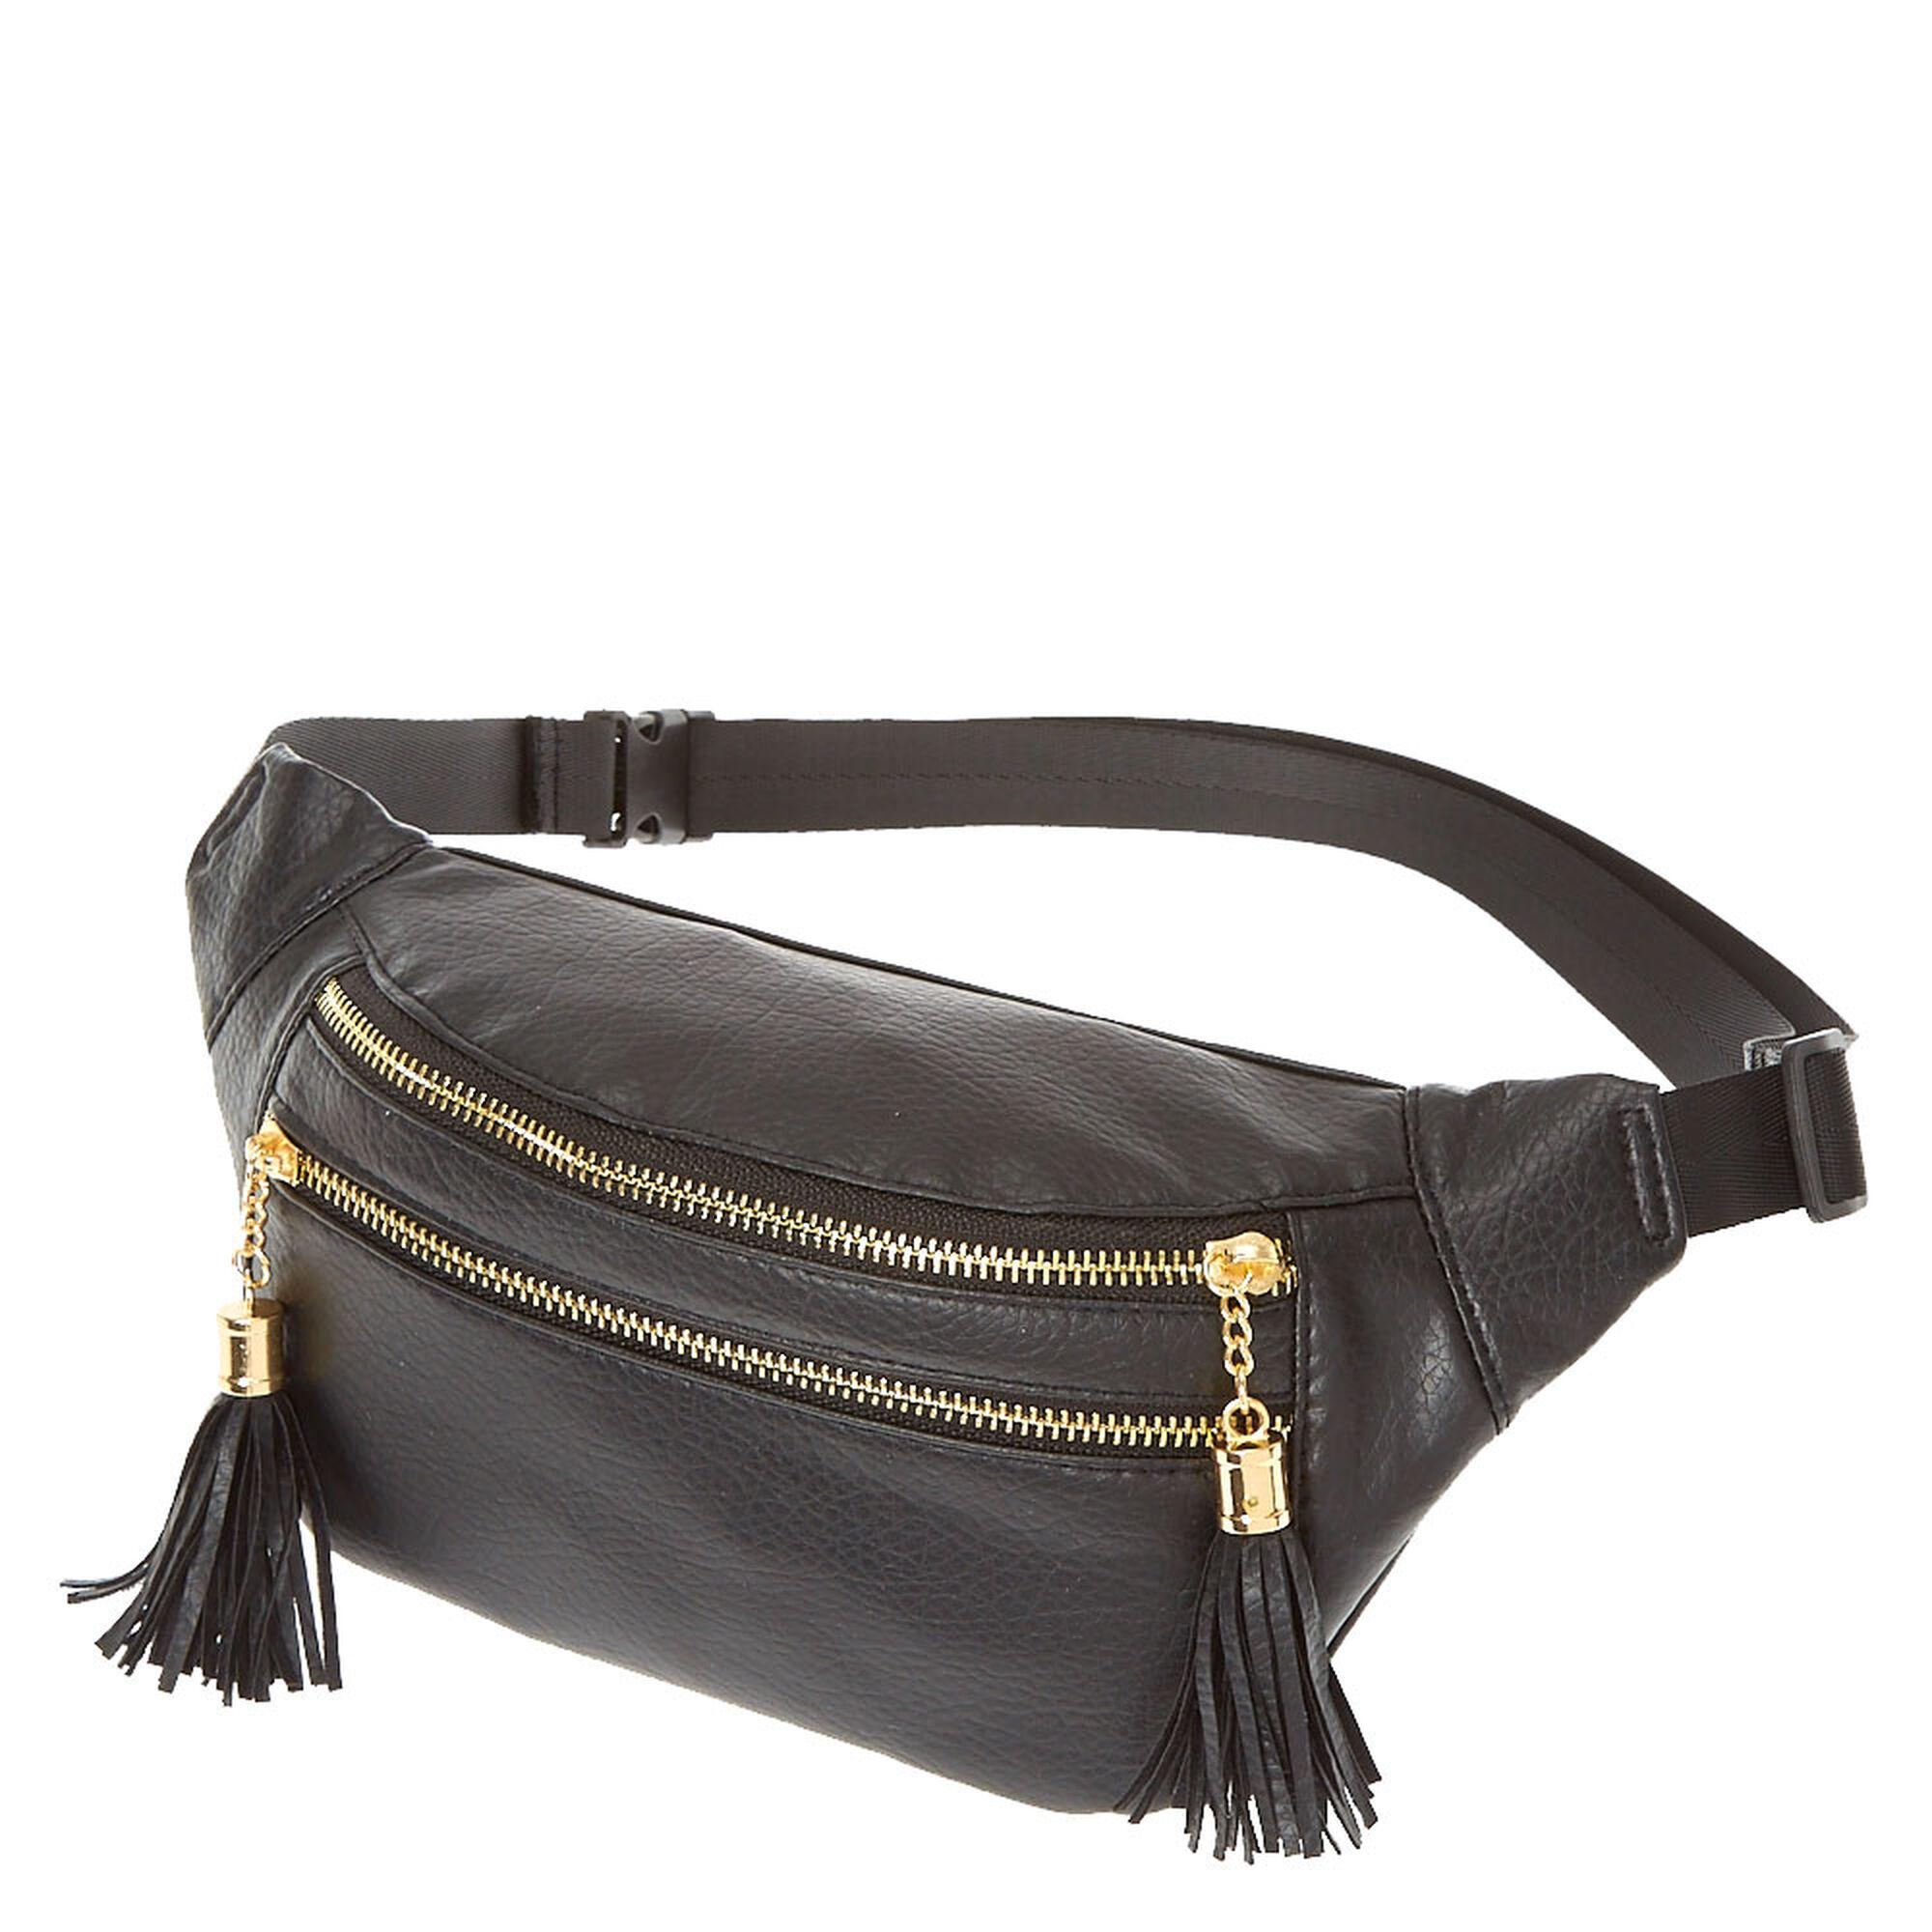 ed8f10d7205c Black Faux Leather Fanny Pack